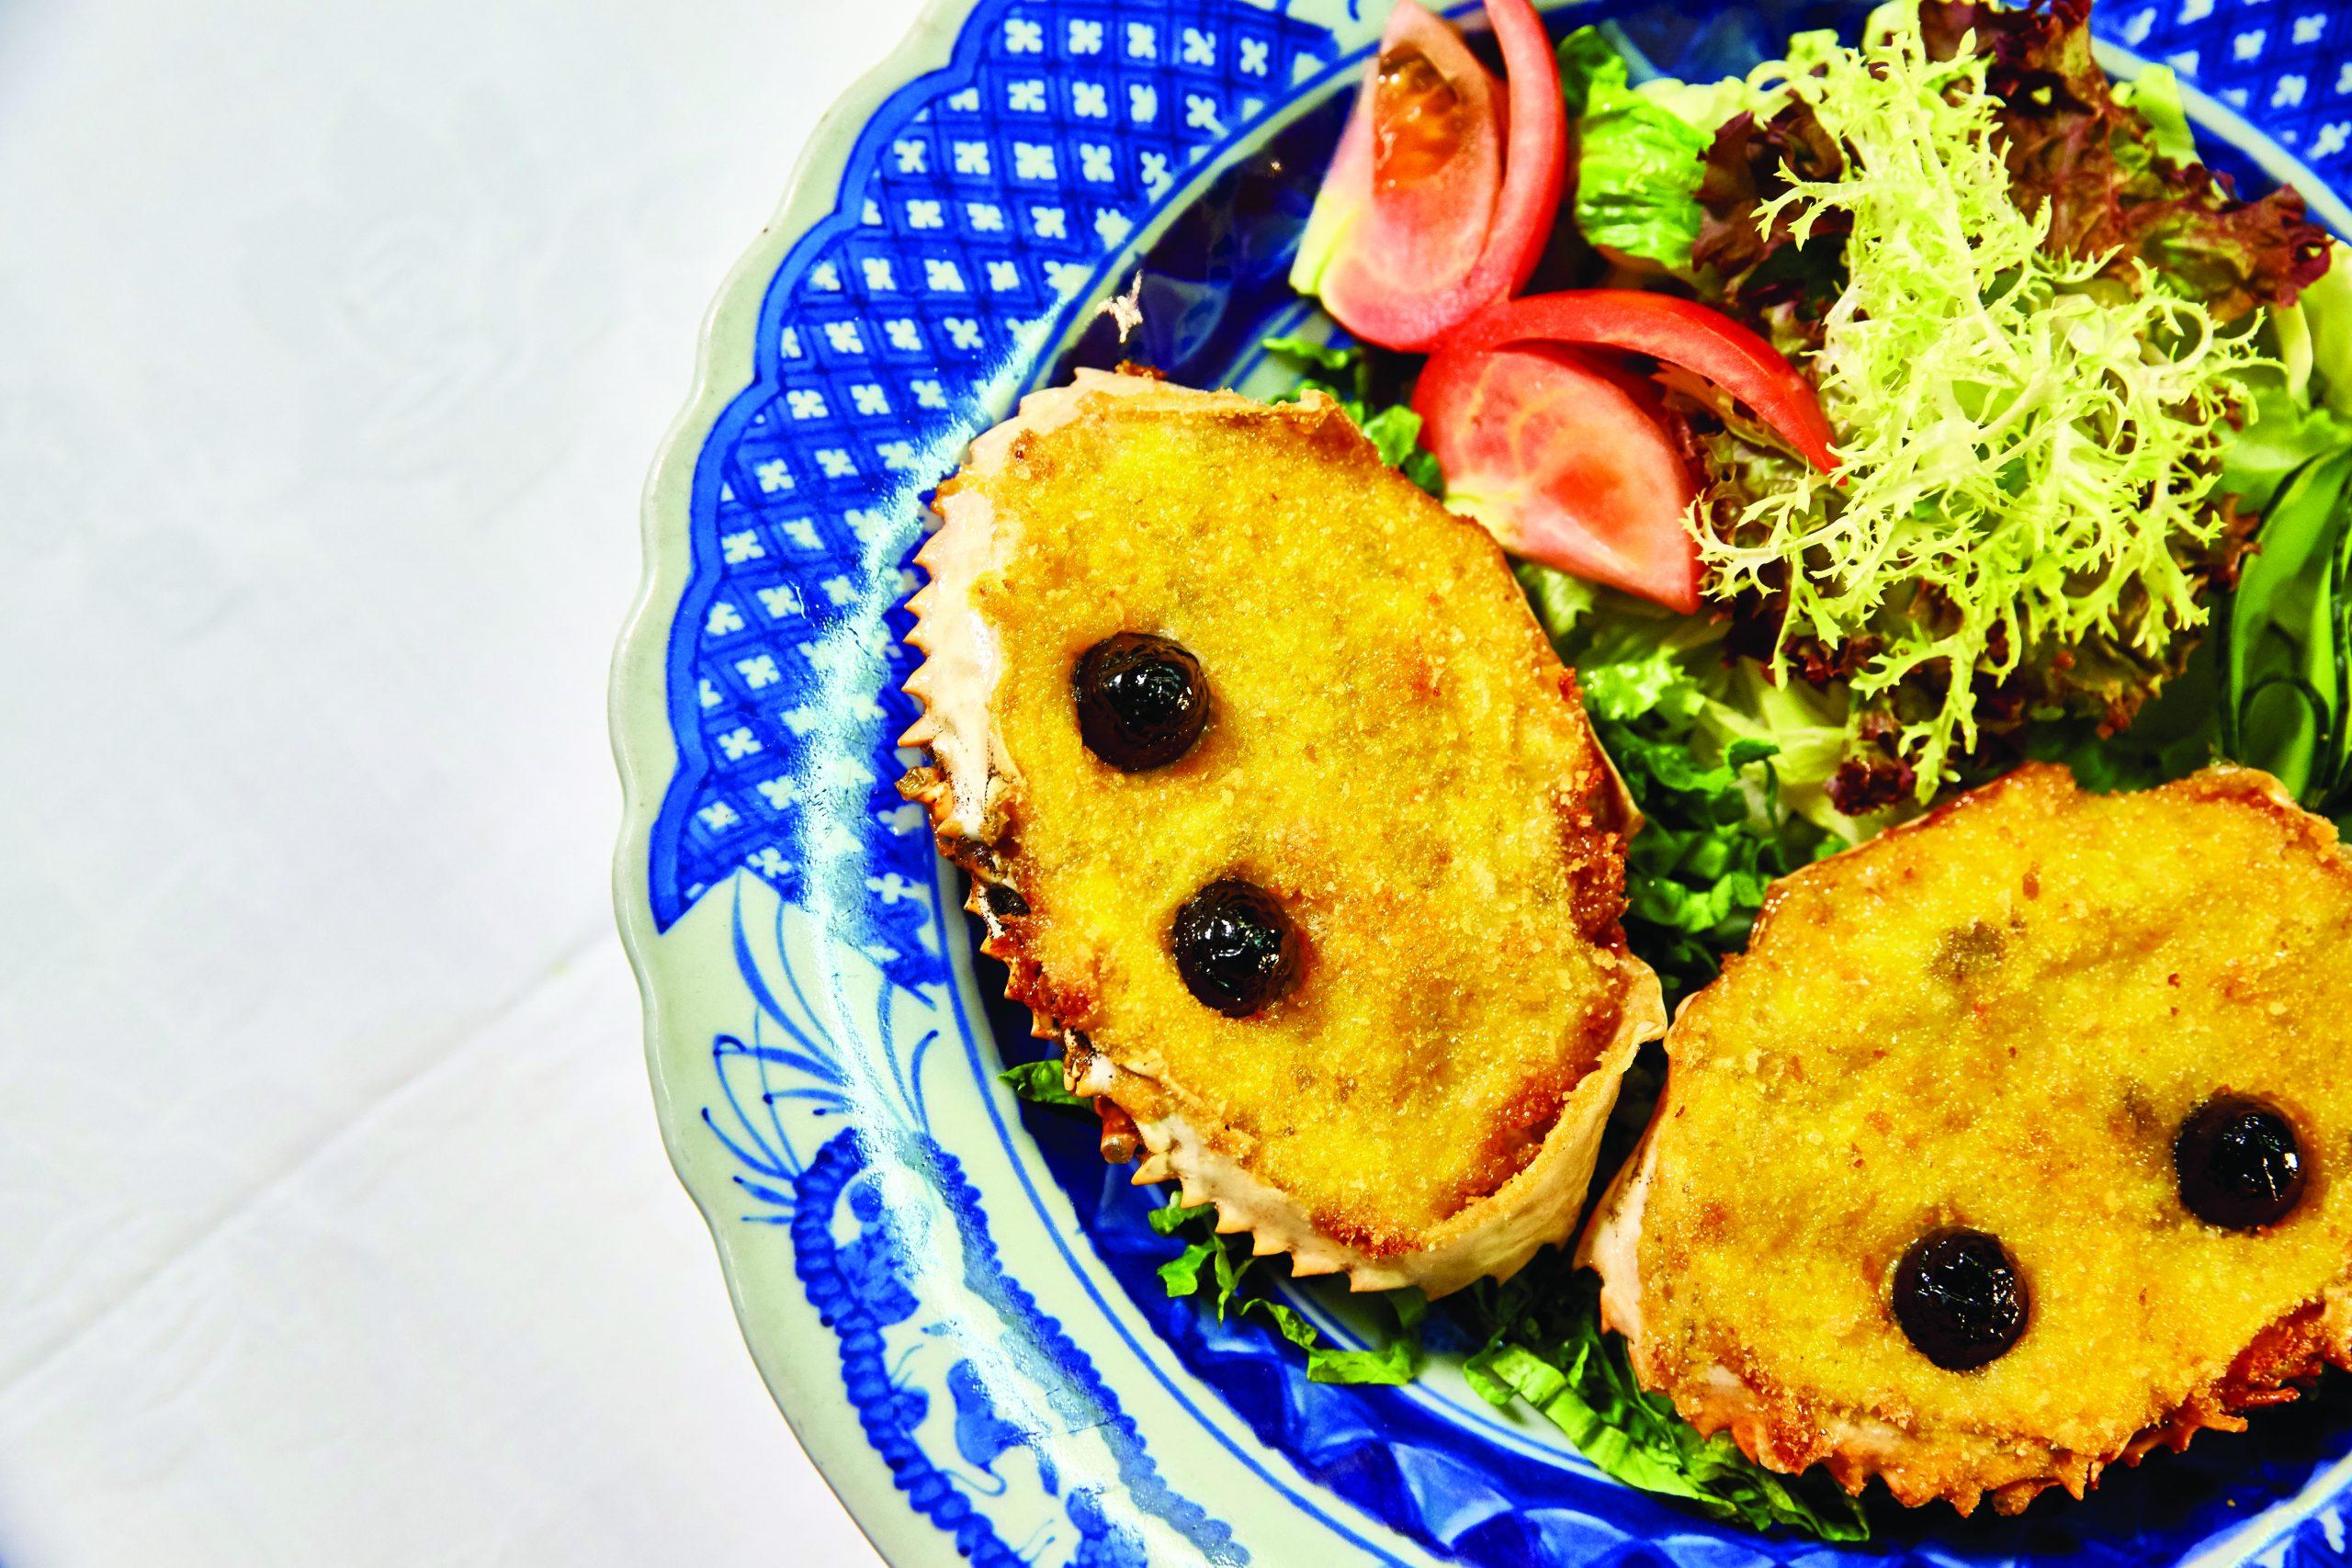 Macanese crab cakes